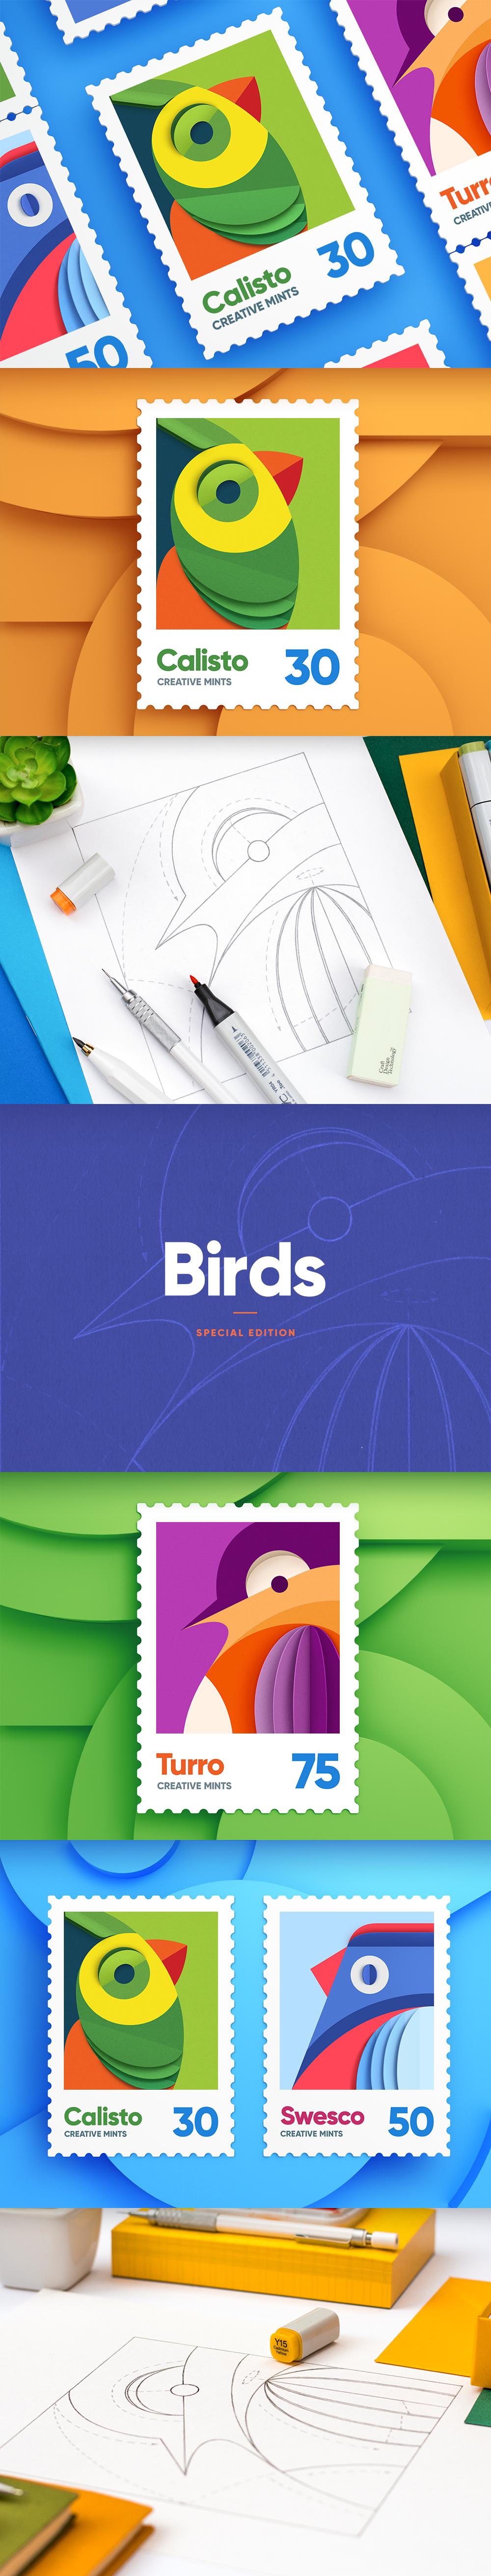 Birds post stamps